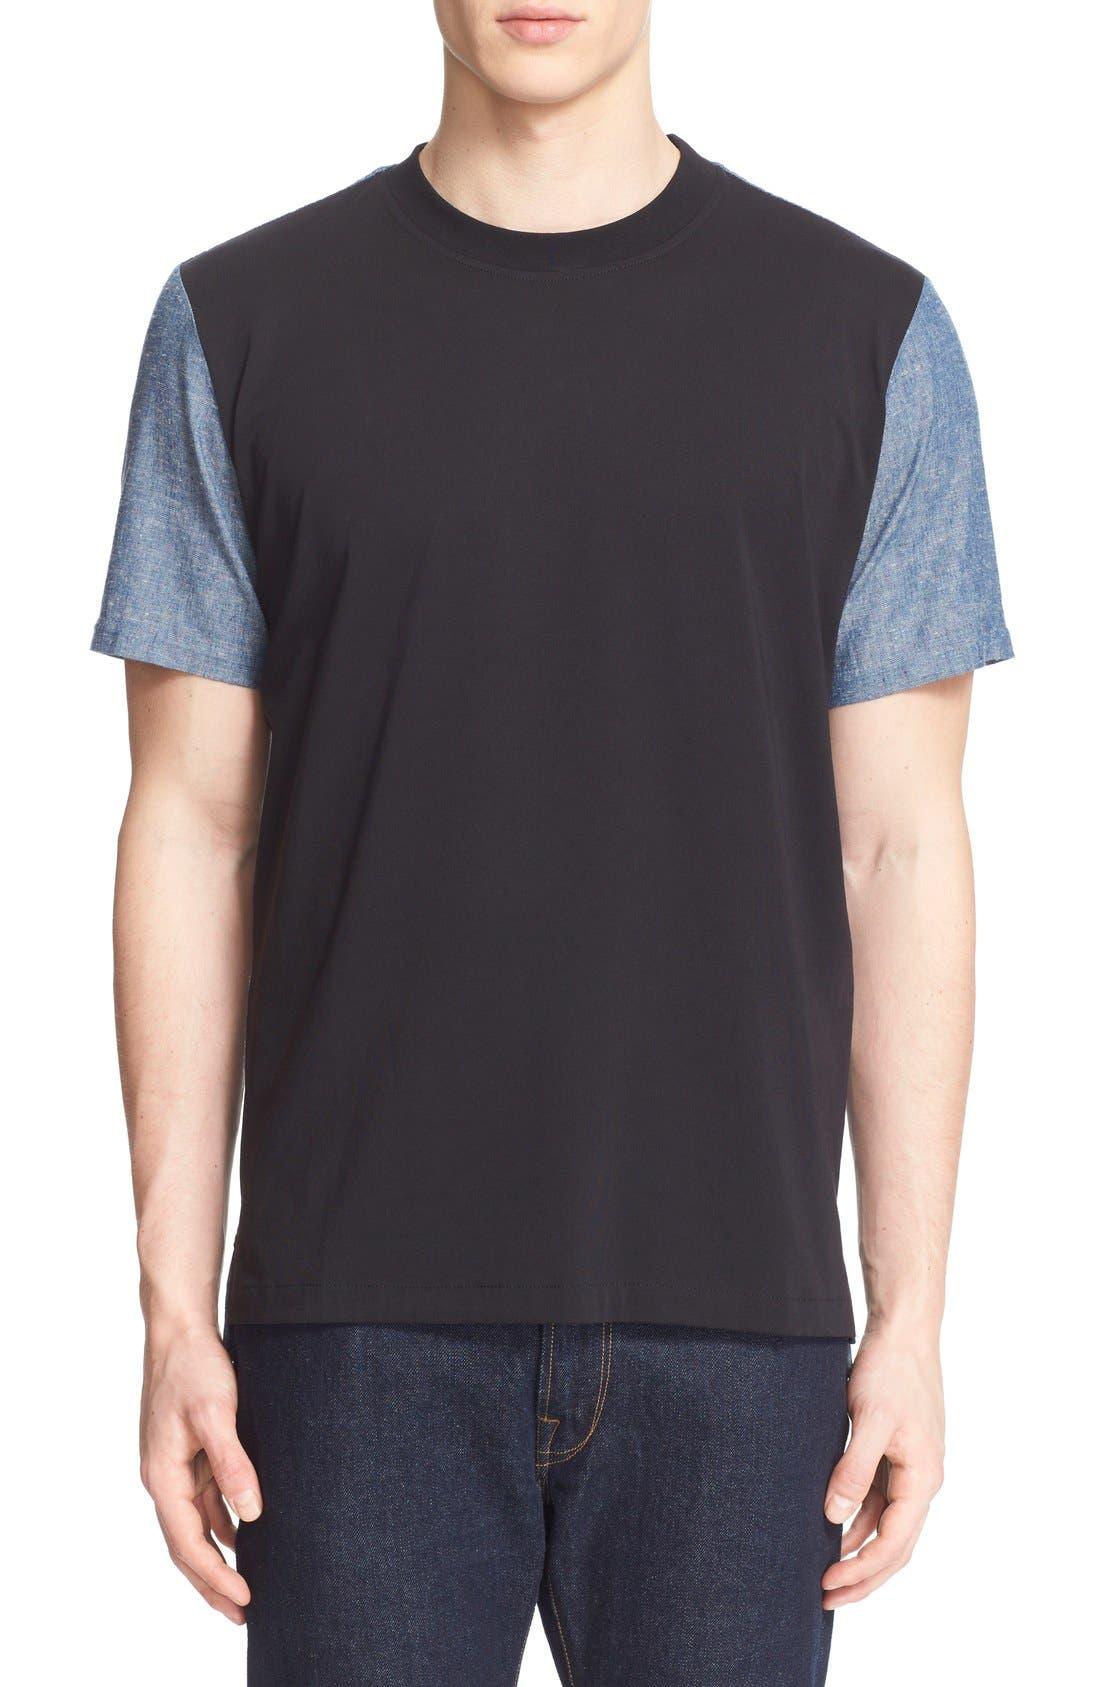 PS PAUL SMITH Colorblock T-Shirt